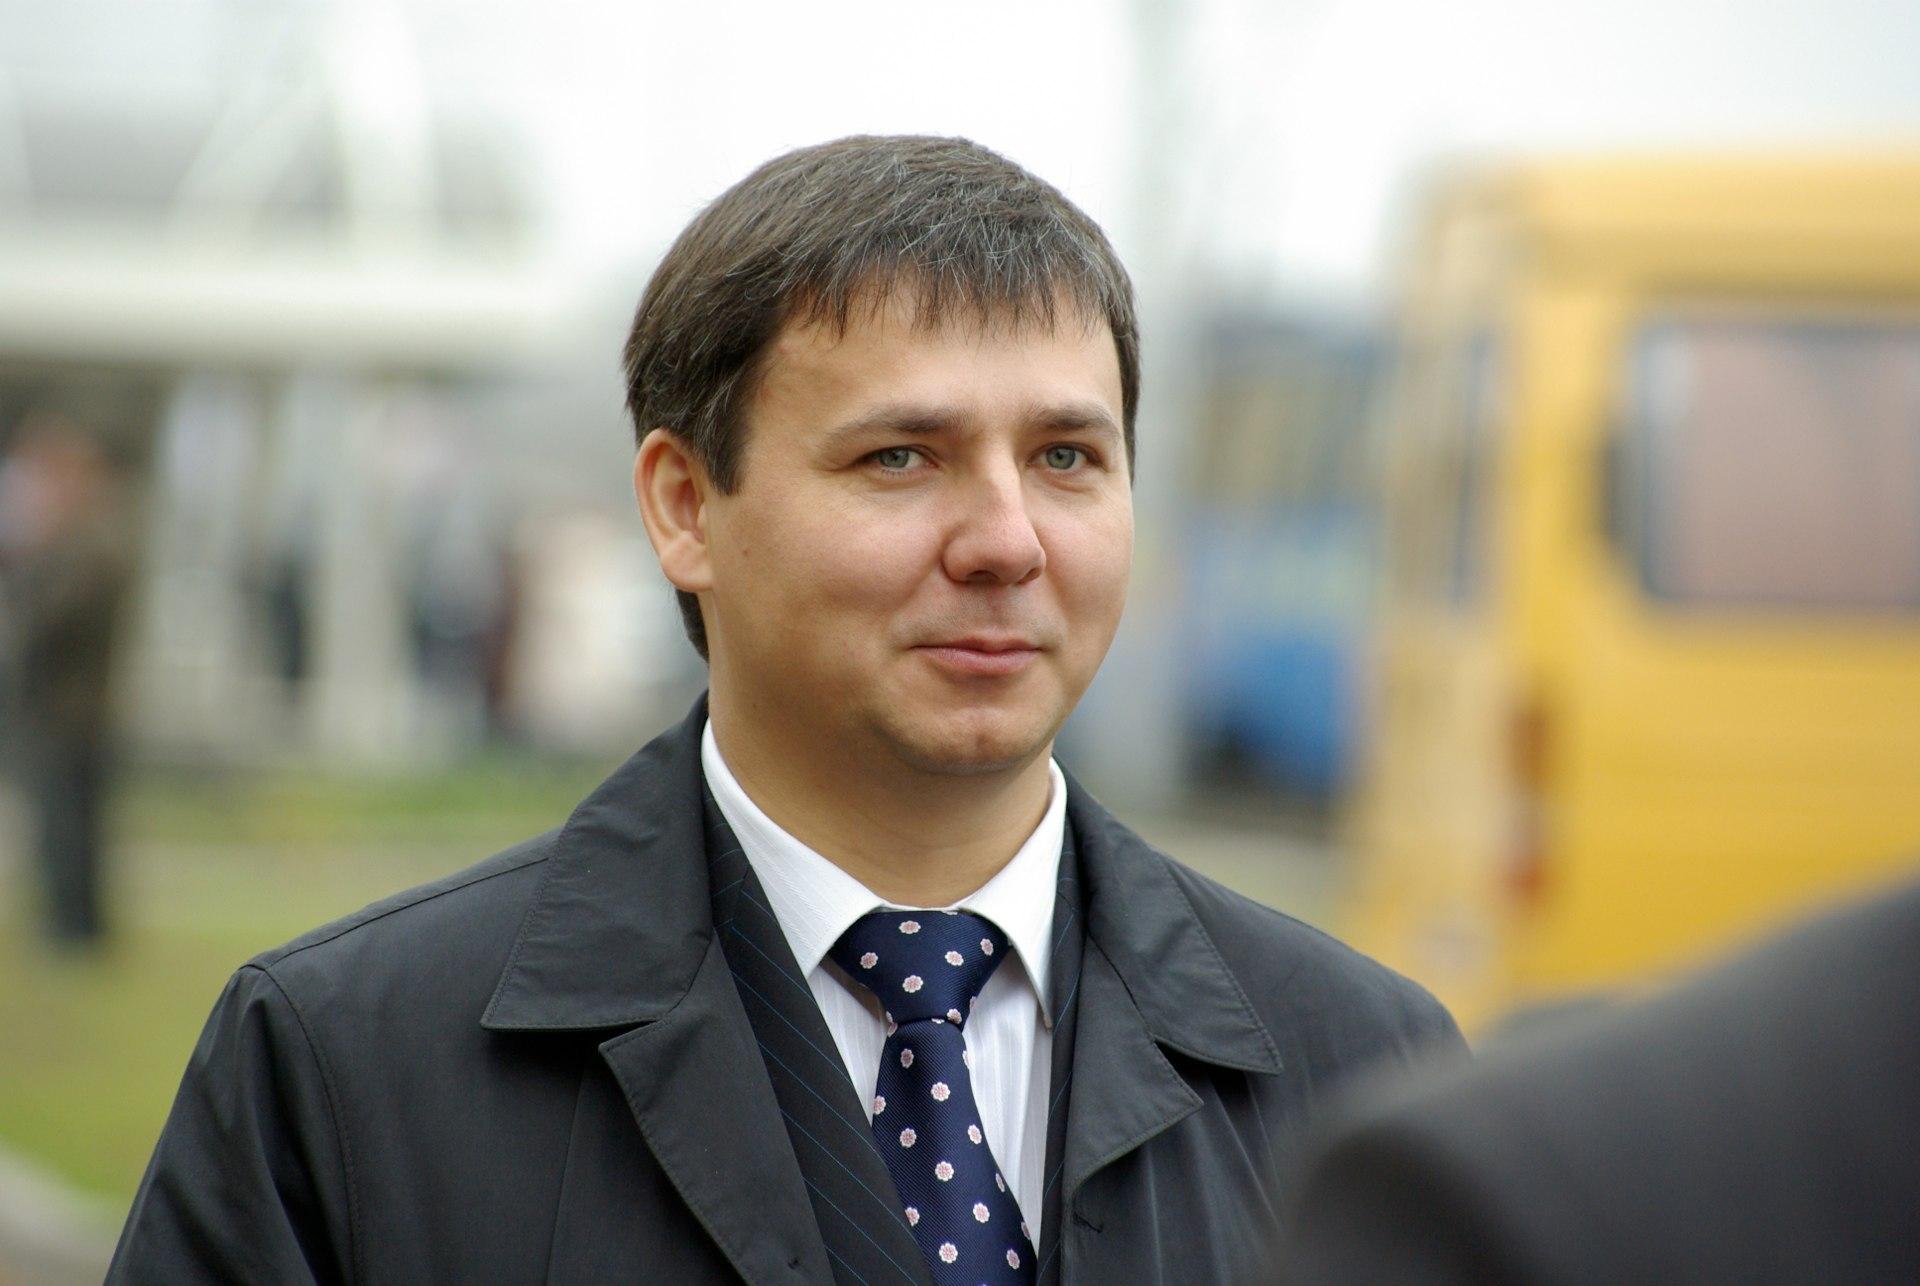 ВТатарстане схвачен экс-начальник исполкома Челнов Фархад Латыпов